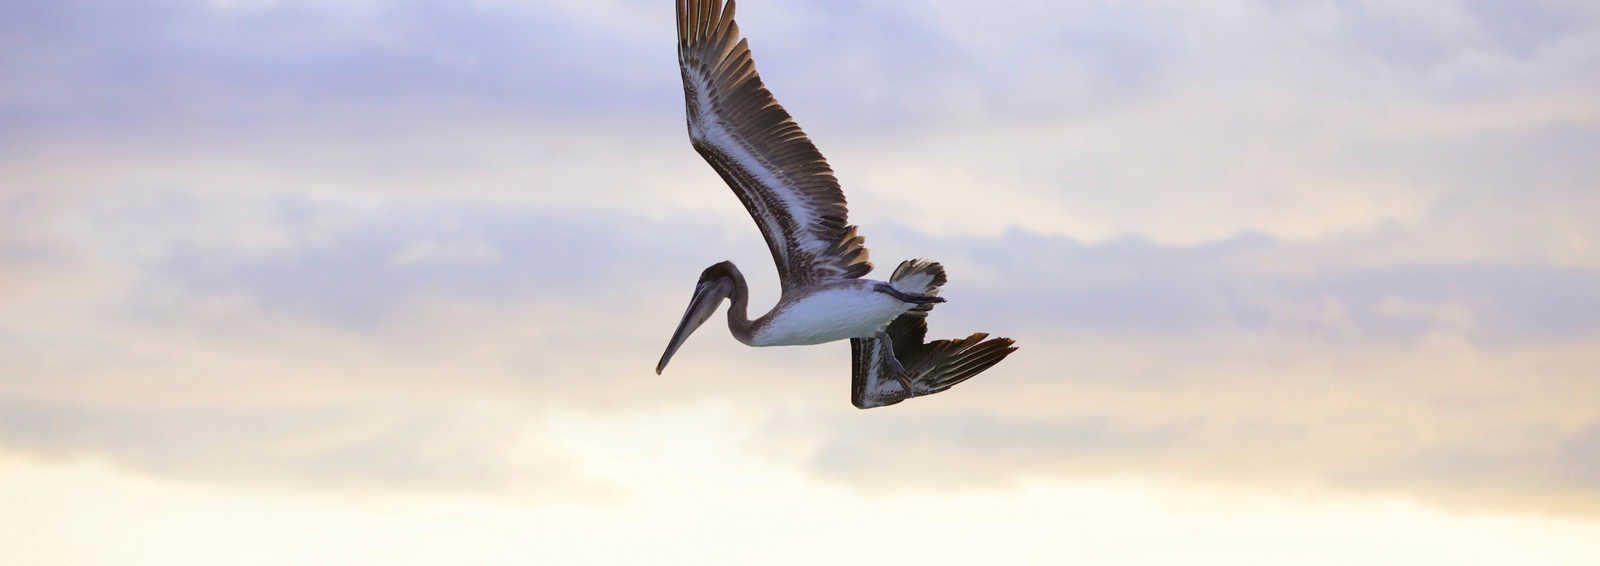 Galapagos Wildlife Cruise Exodus Pelican Pedal Boat Wiring Diagram